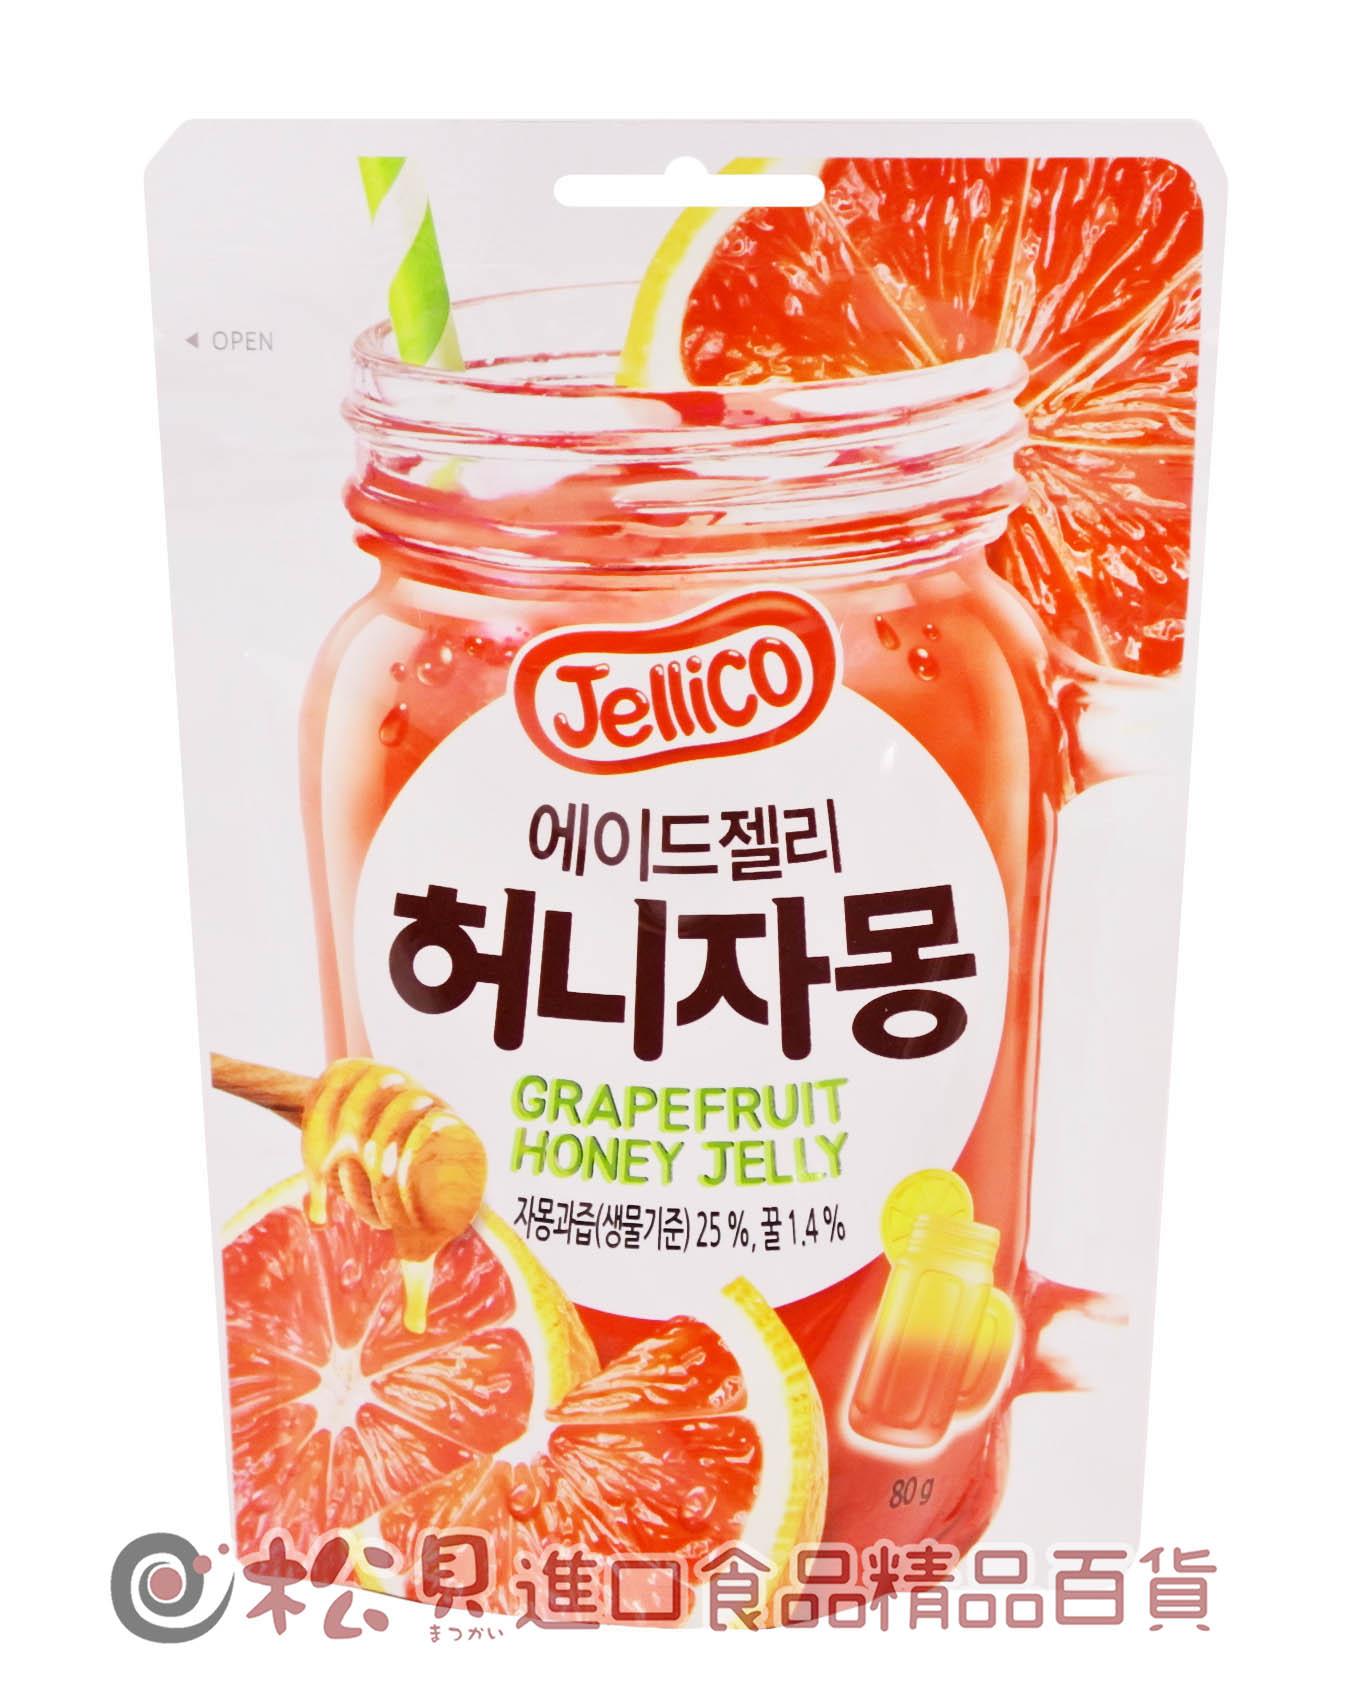 Jellico蜂蜜葡柚軟糖80g【8801204505146】